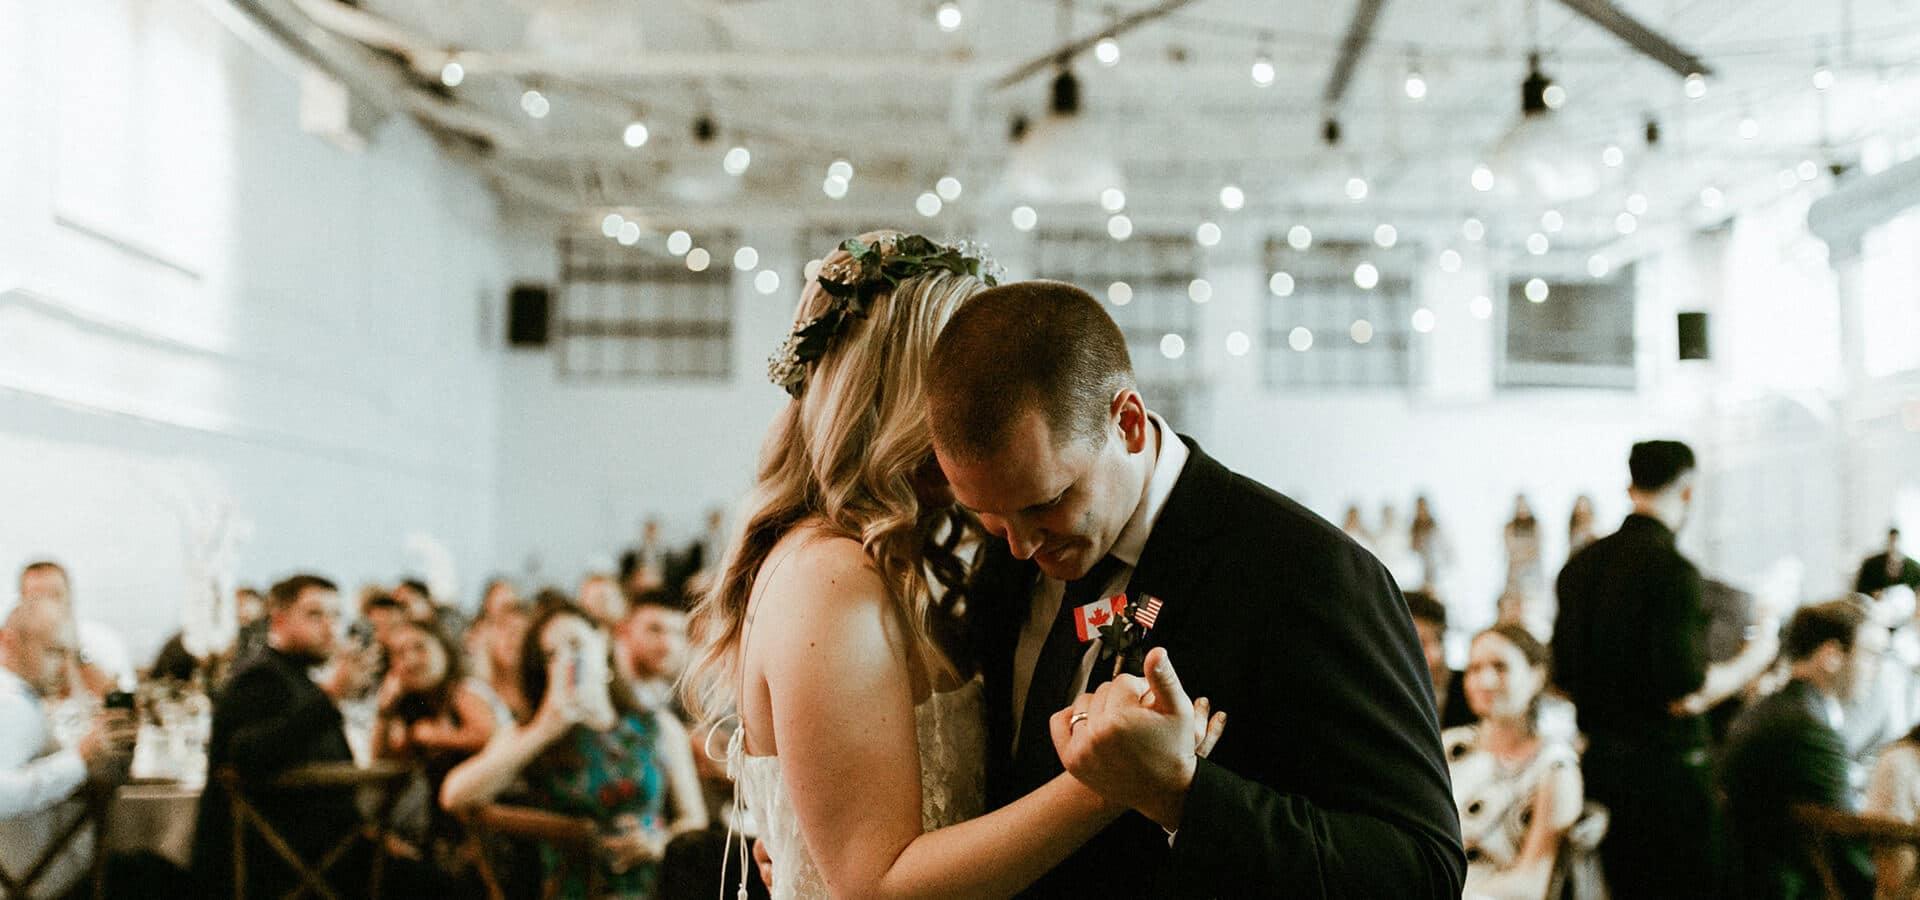 Hero image for Ashley and Ben's Rustically Elegant Airship37 Wedding